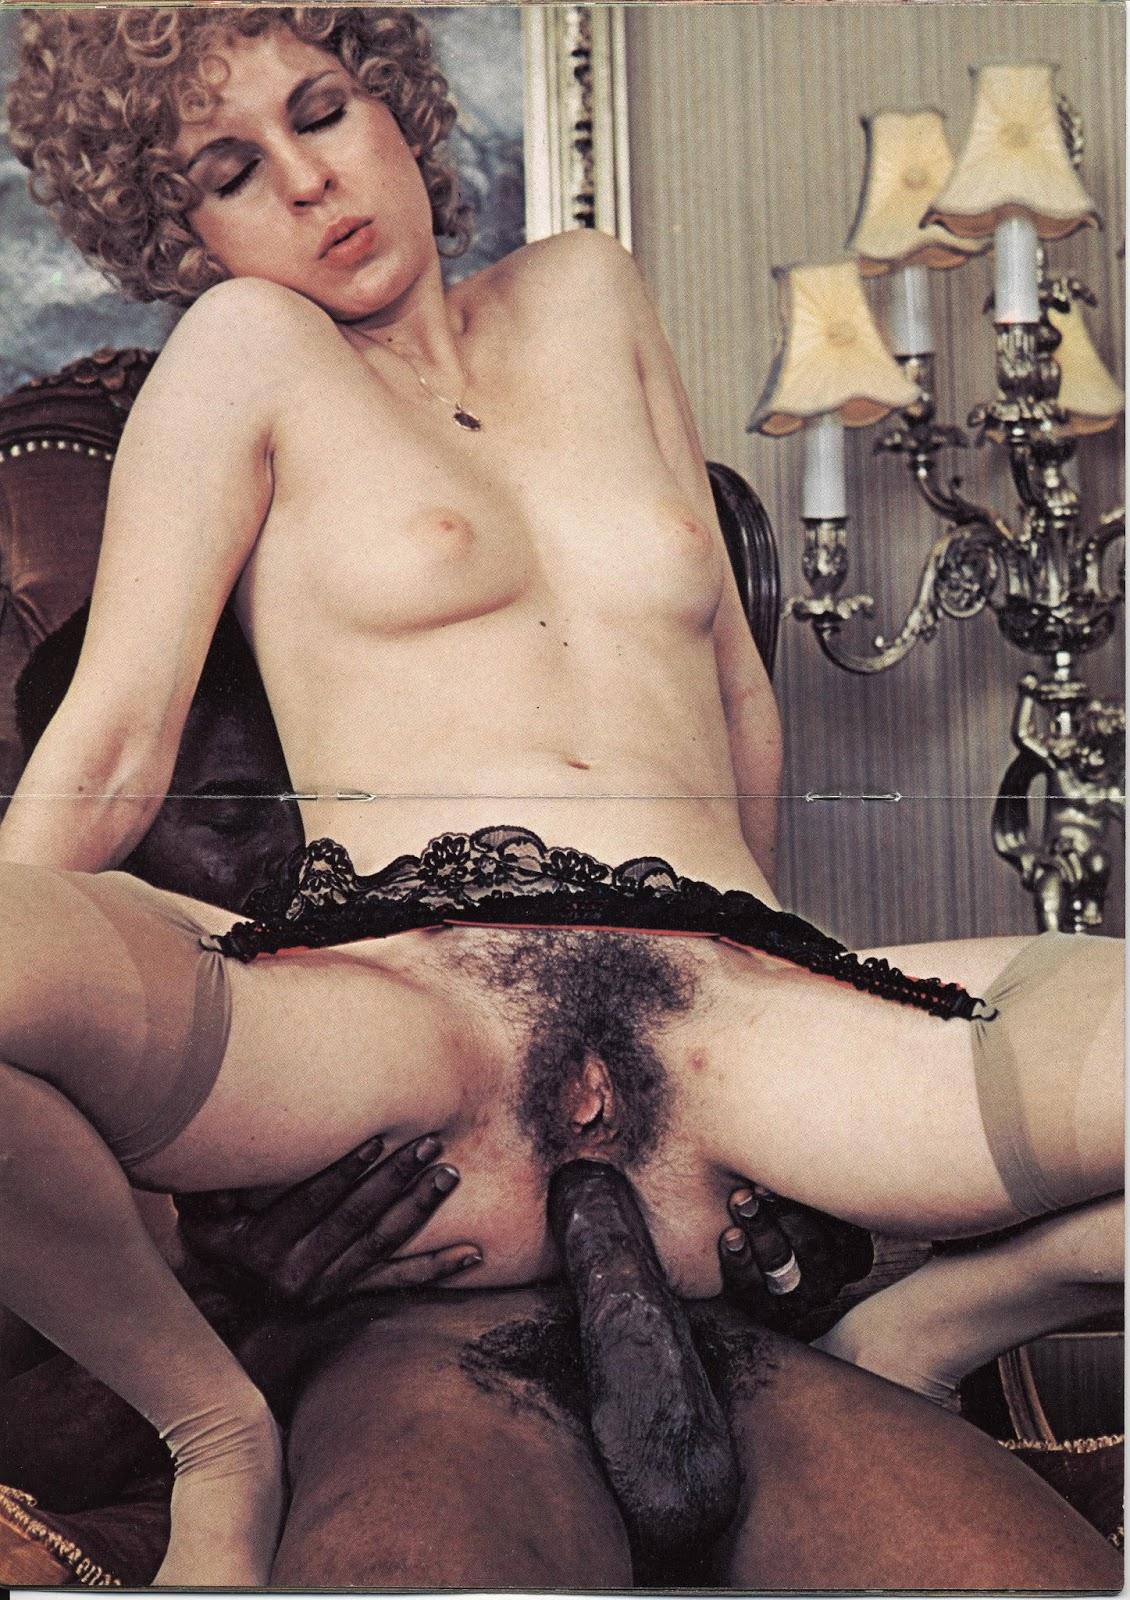 Naturalna Kobieco Retro Porno - Kobiety Z Ubiegego -3384